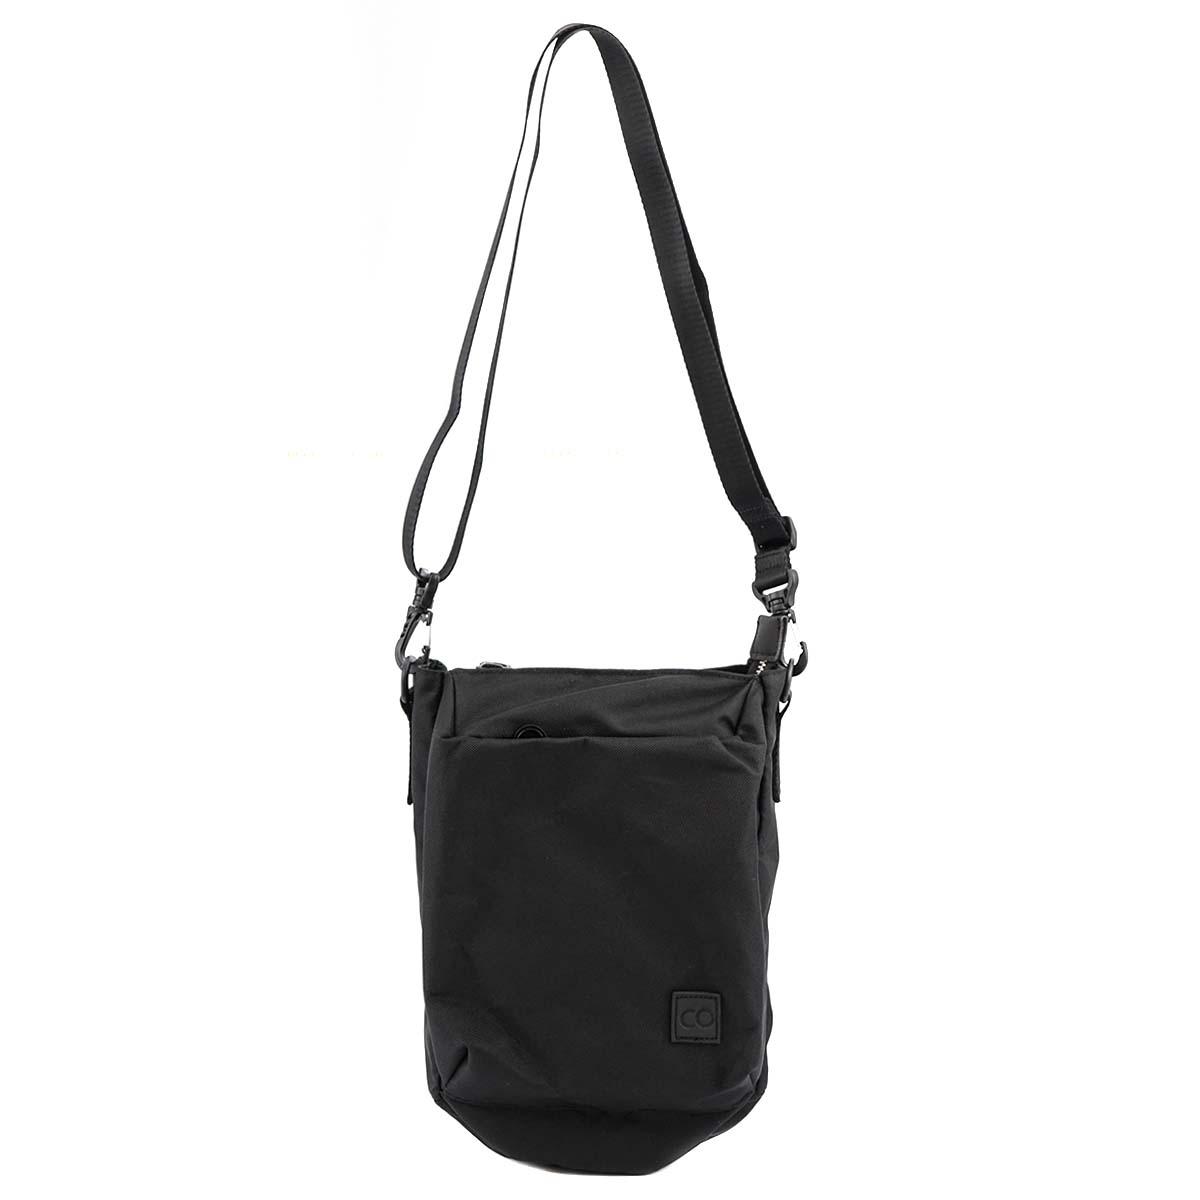 C6 シーシックス ショルダーバッグ 2019年-2020年秋冬新作 C2086 Fermis Pouch メンズ 男性 BLACK ブラック カバン 鞄【送料無料 並行輸入品】